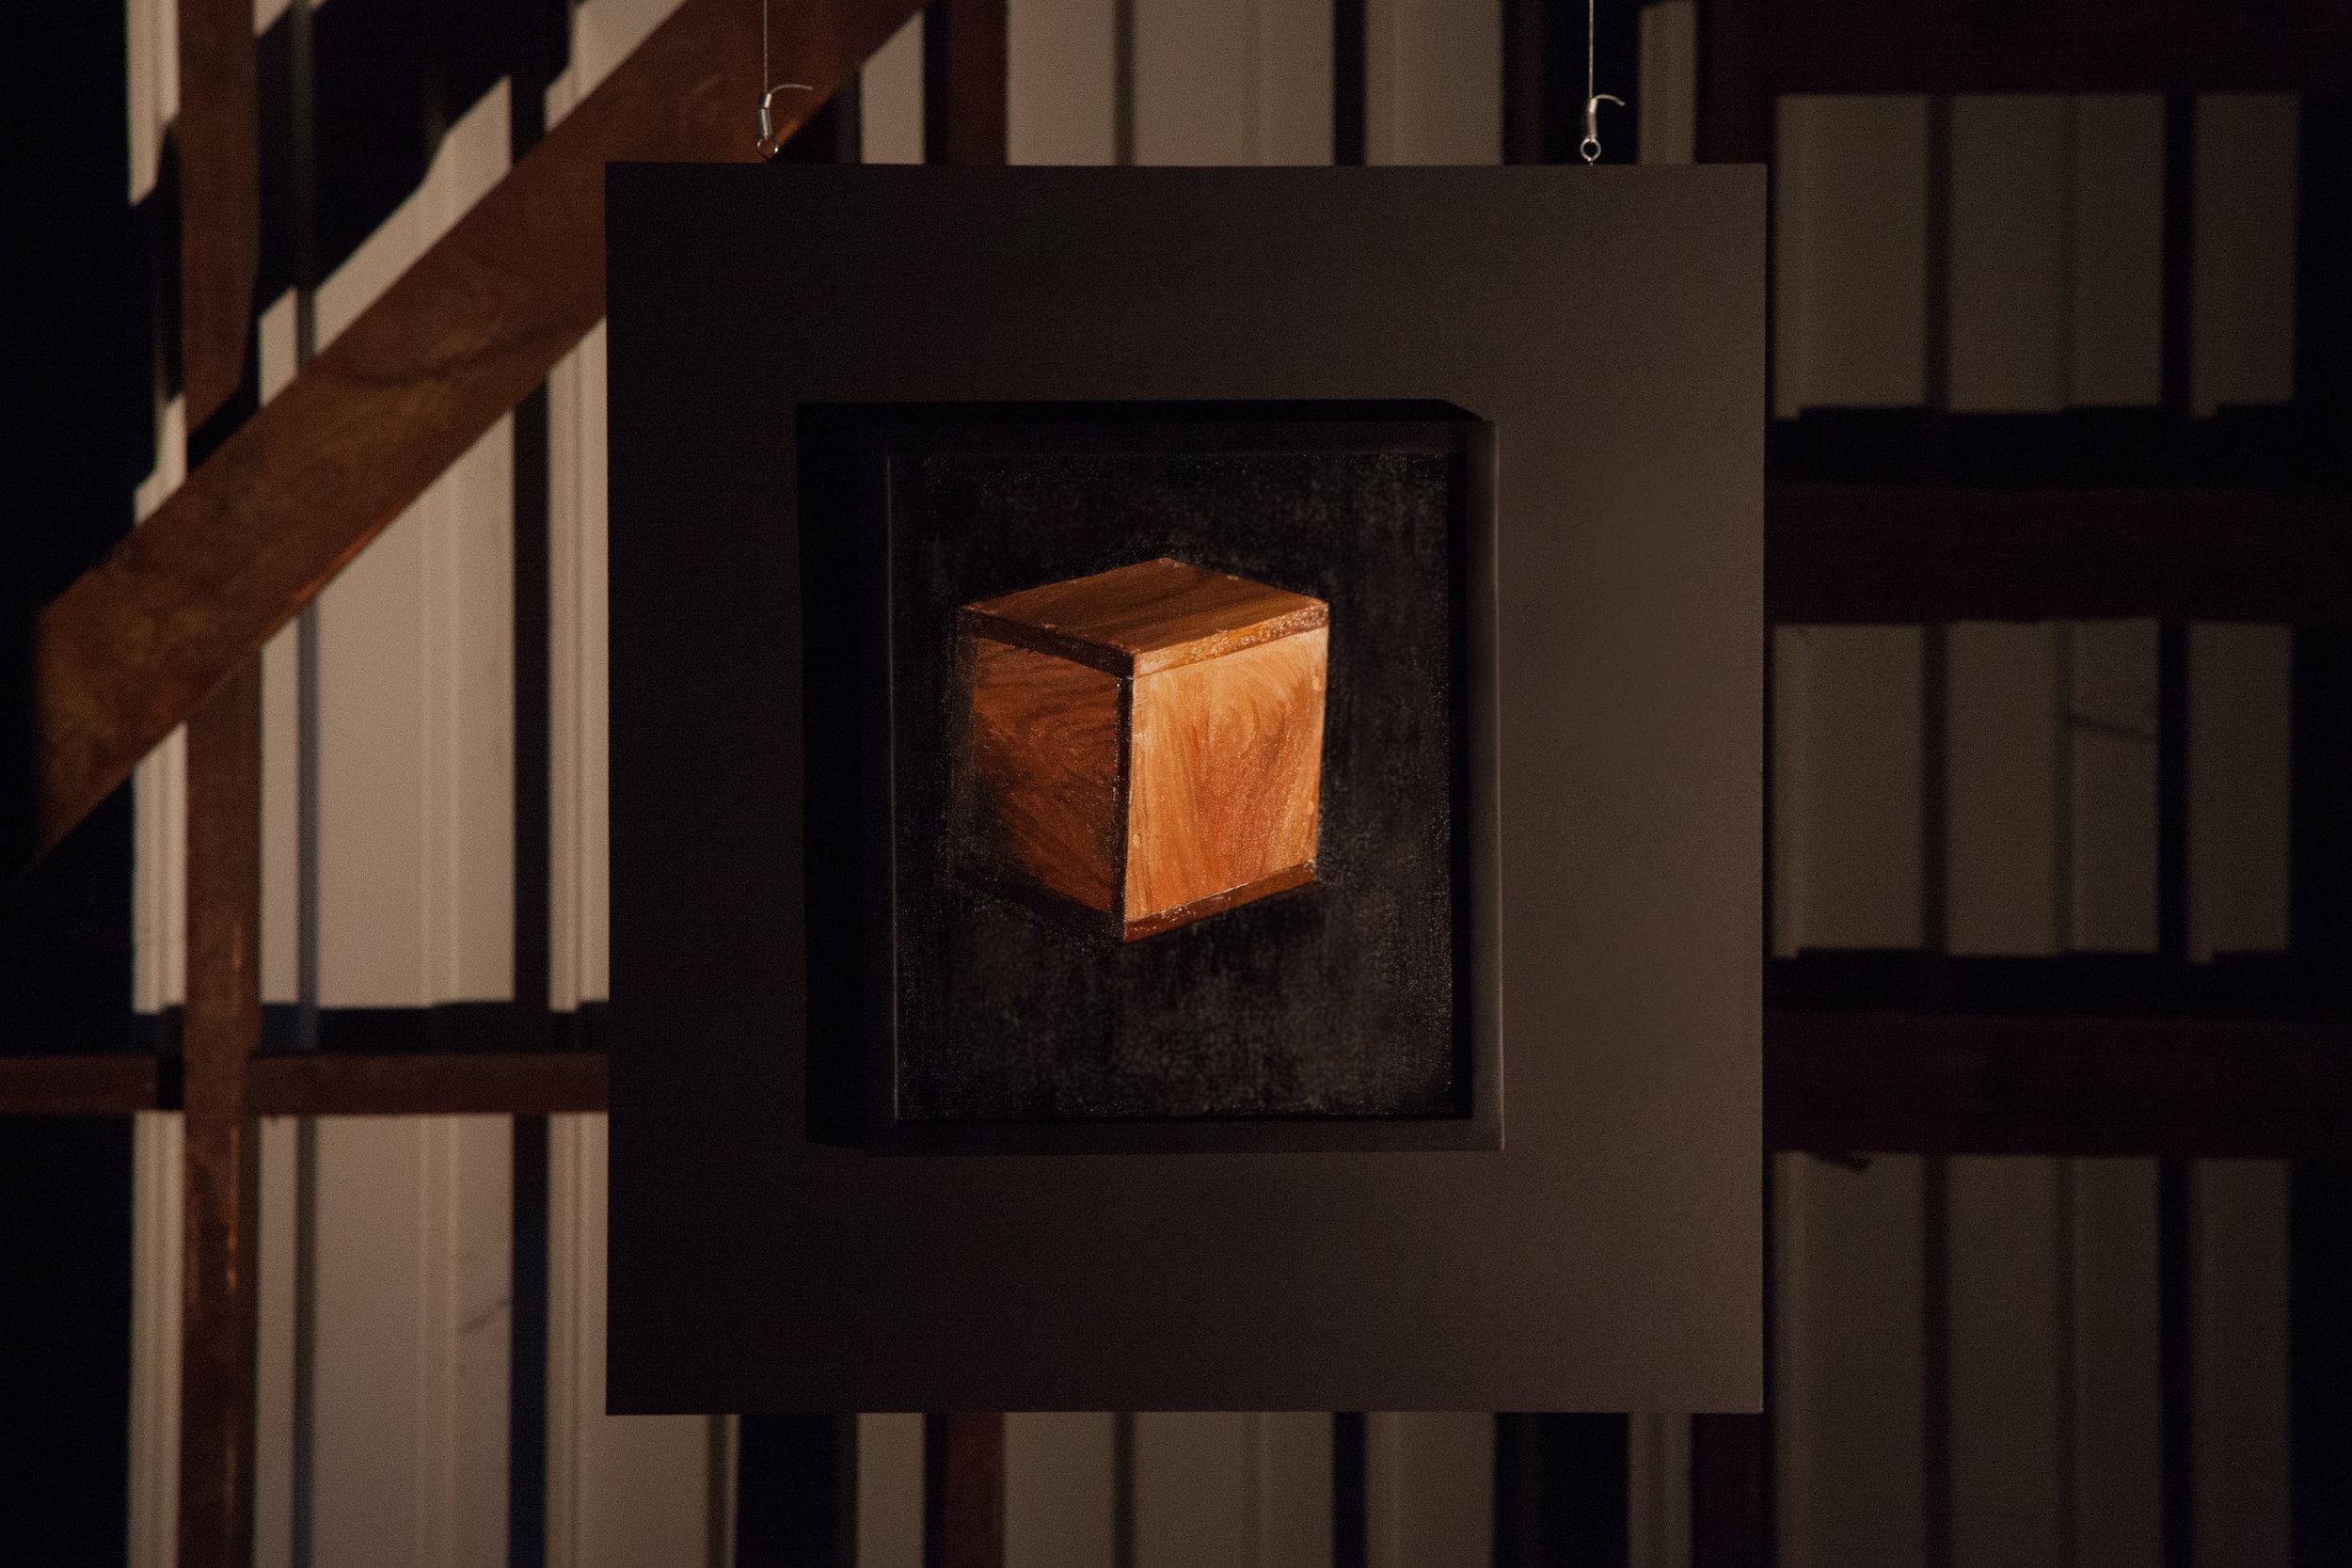 Box with No Sound.jpg